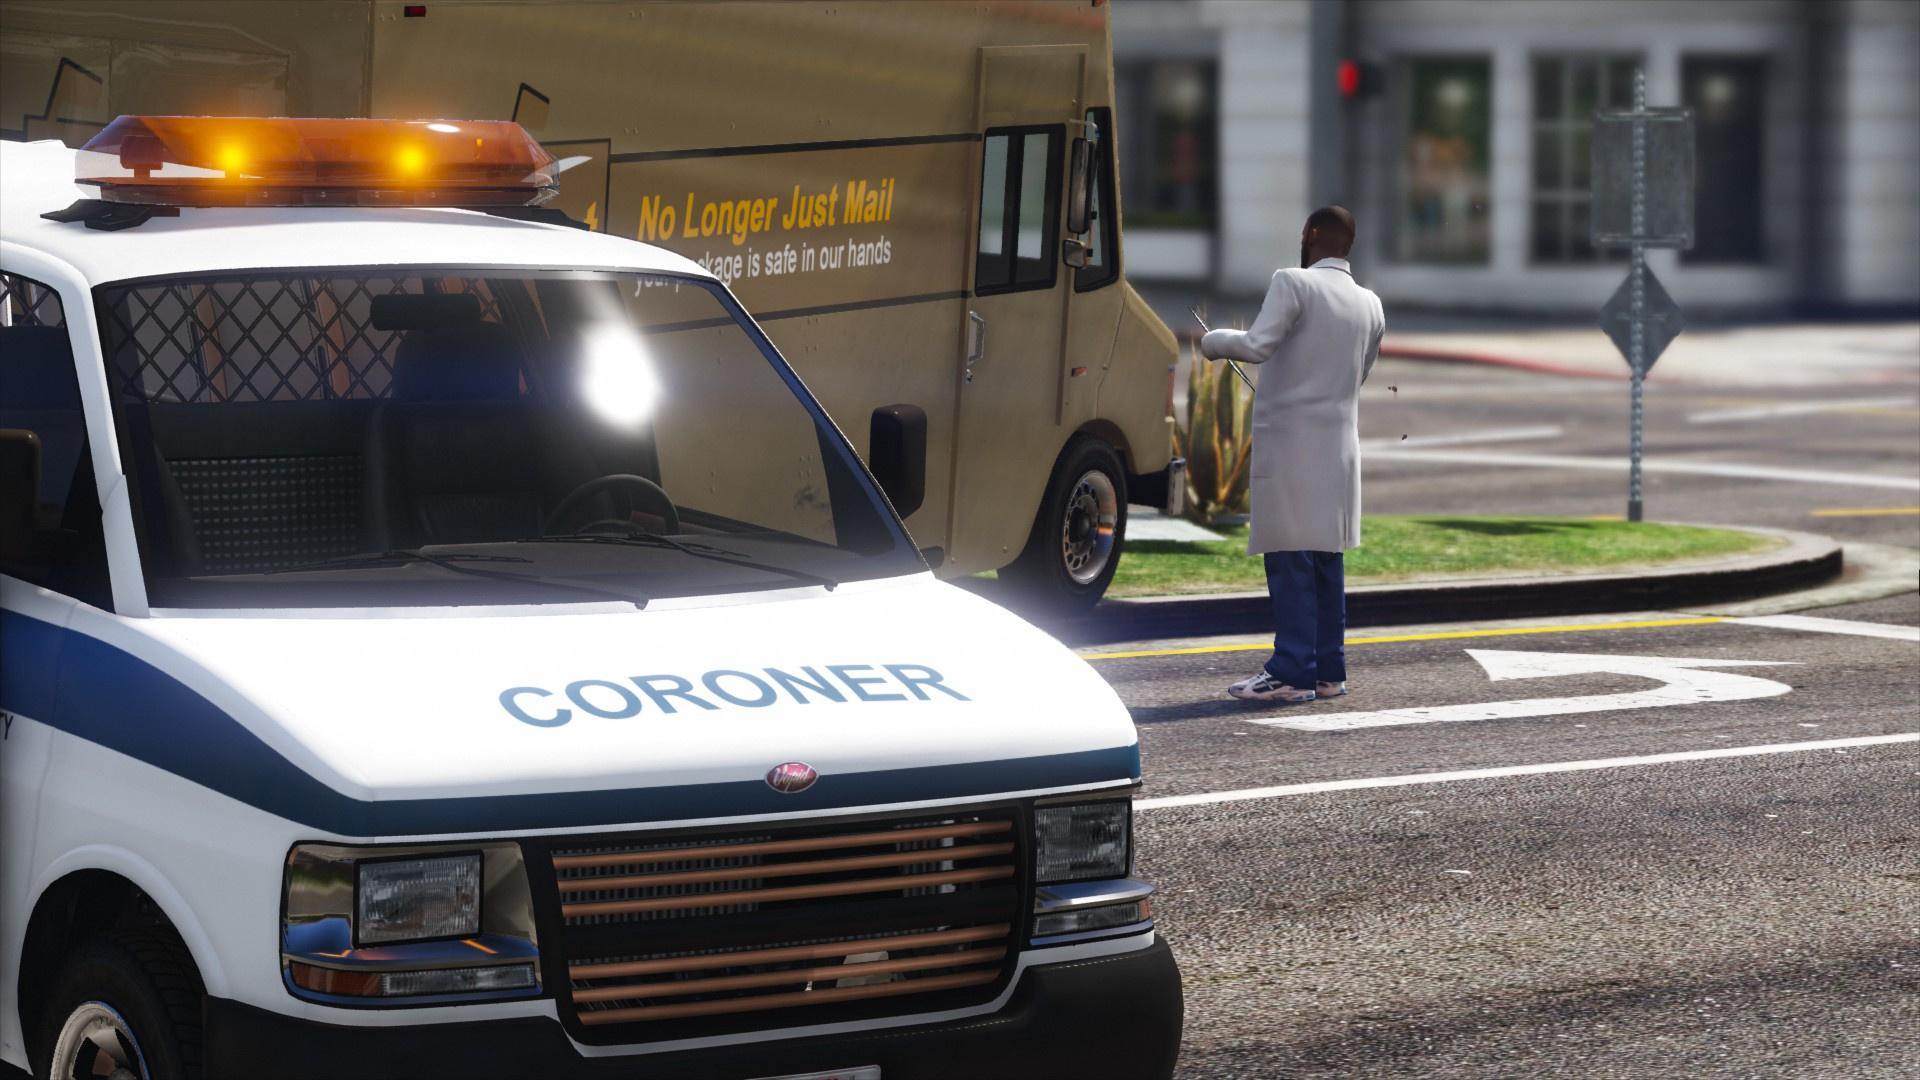 Coroner Service - GTA5-Mods com